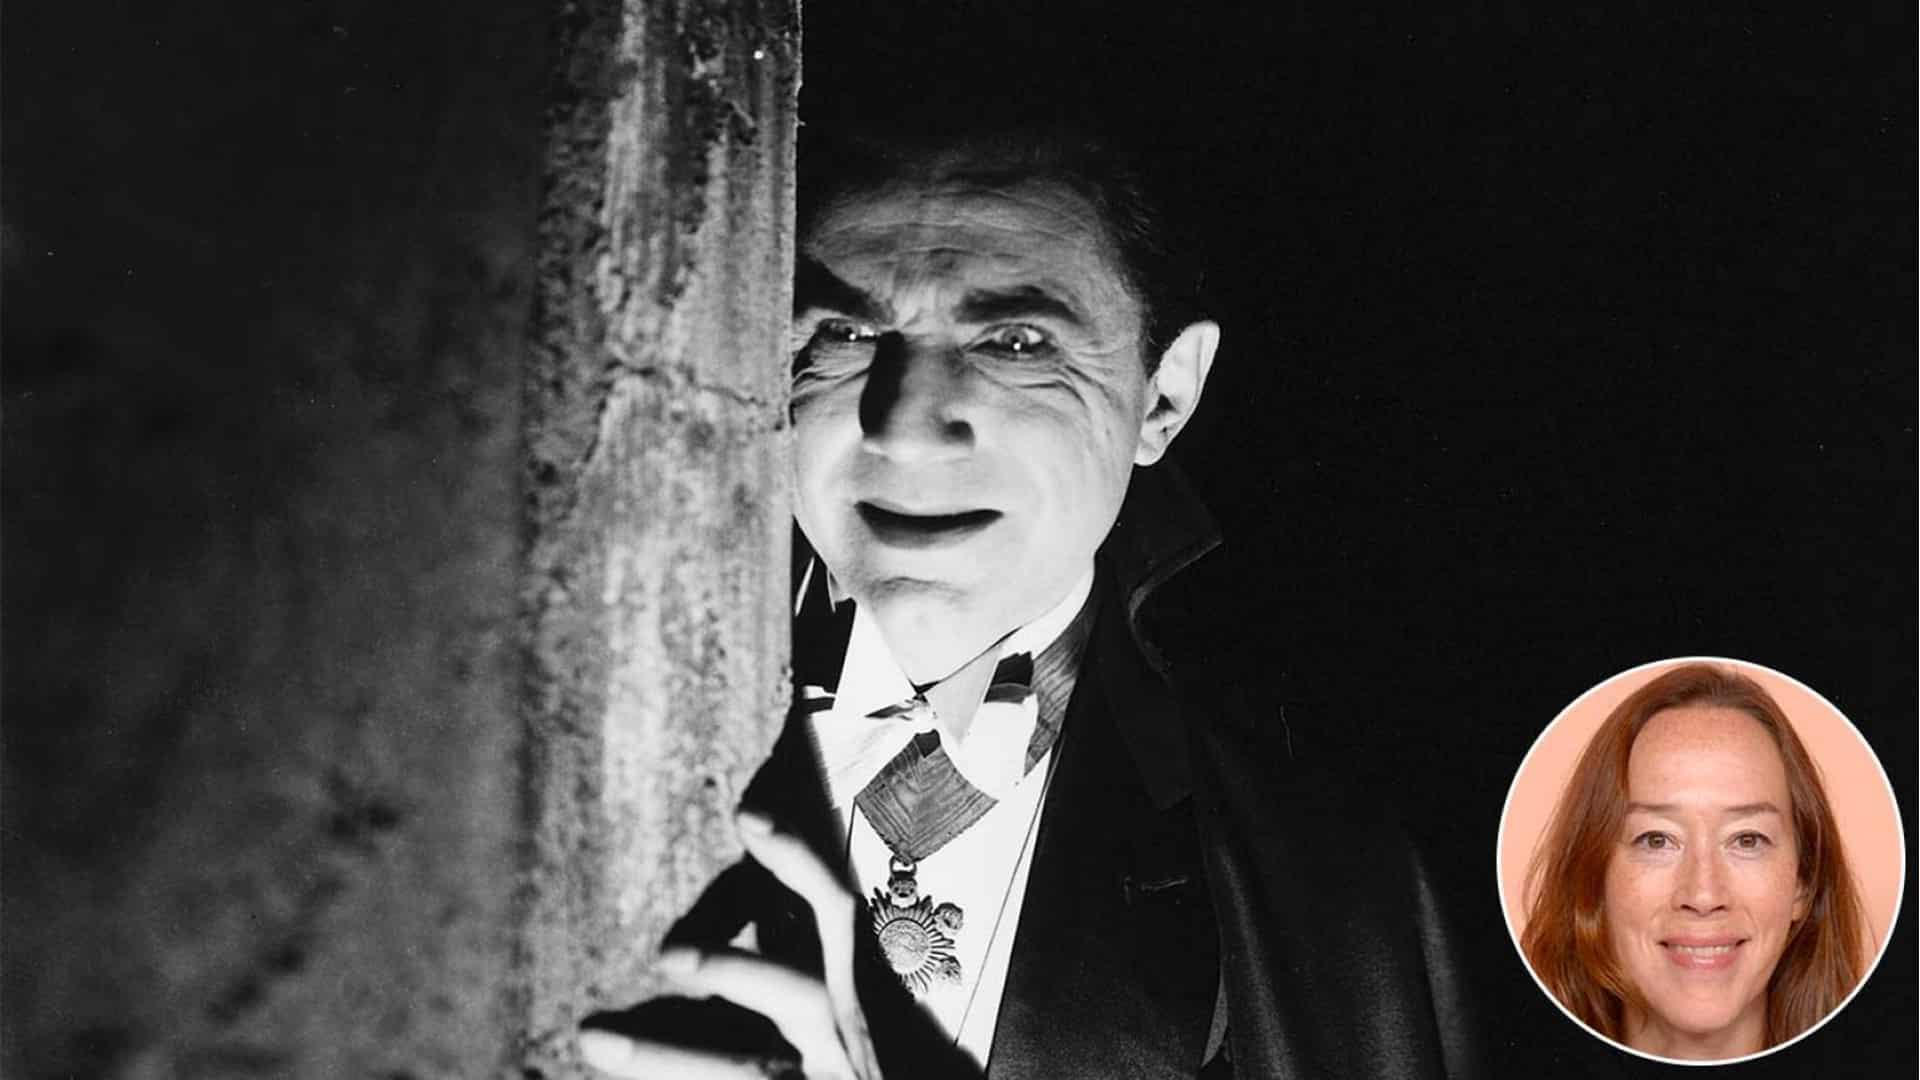 Dracula Karyn Kusama